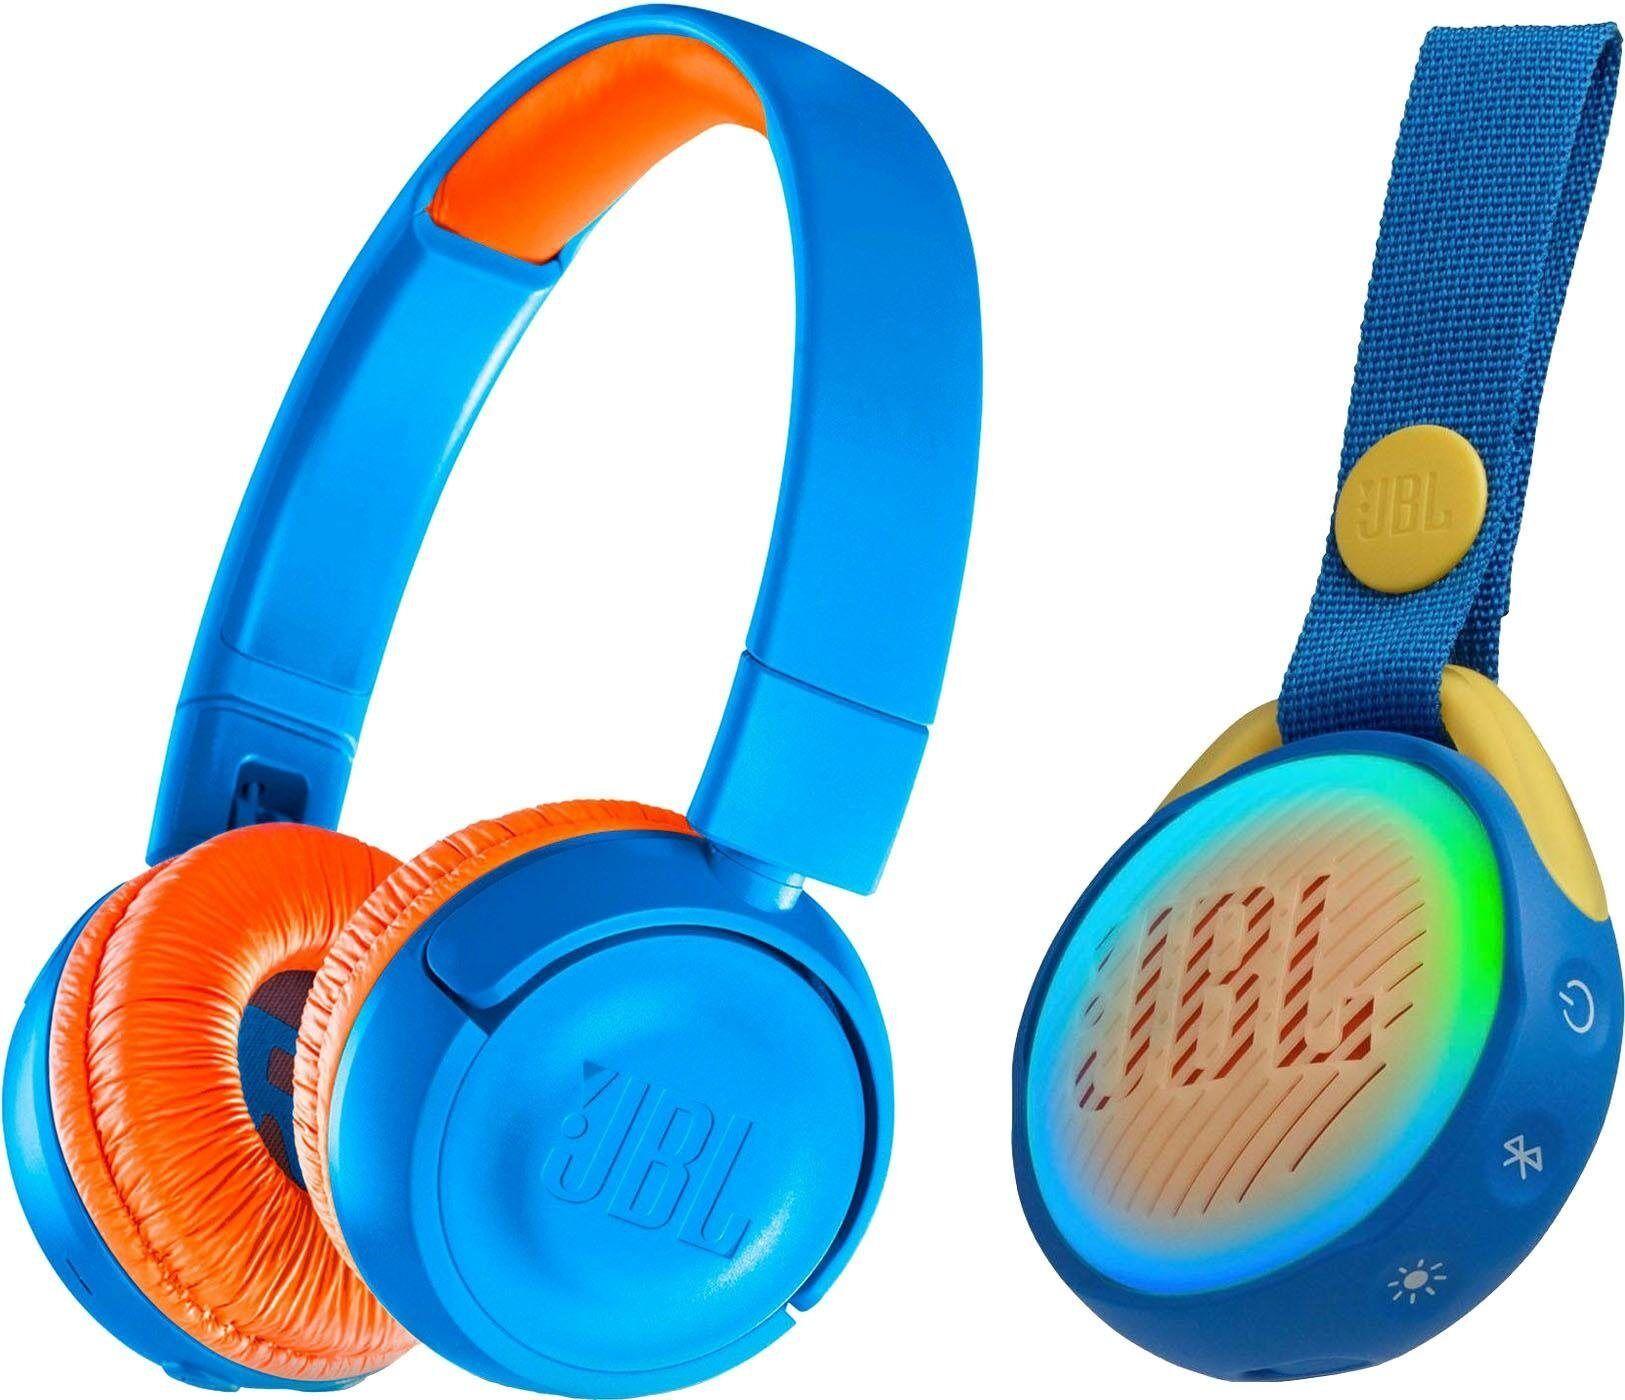 JBL »JR300BT + POP« On-Ear-Kopfhörer (Bluetooth, + Bluetooth-Lautsprecher, für Kinder), blau